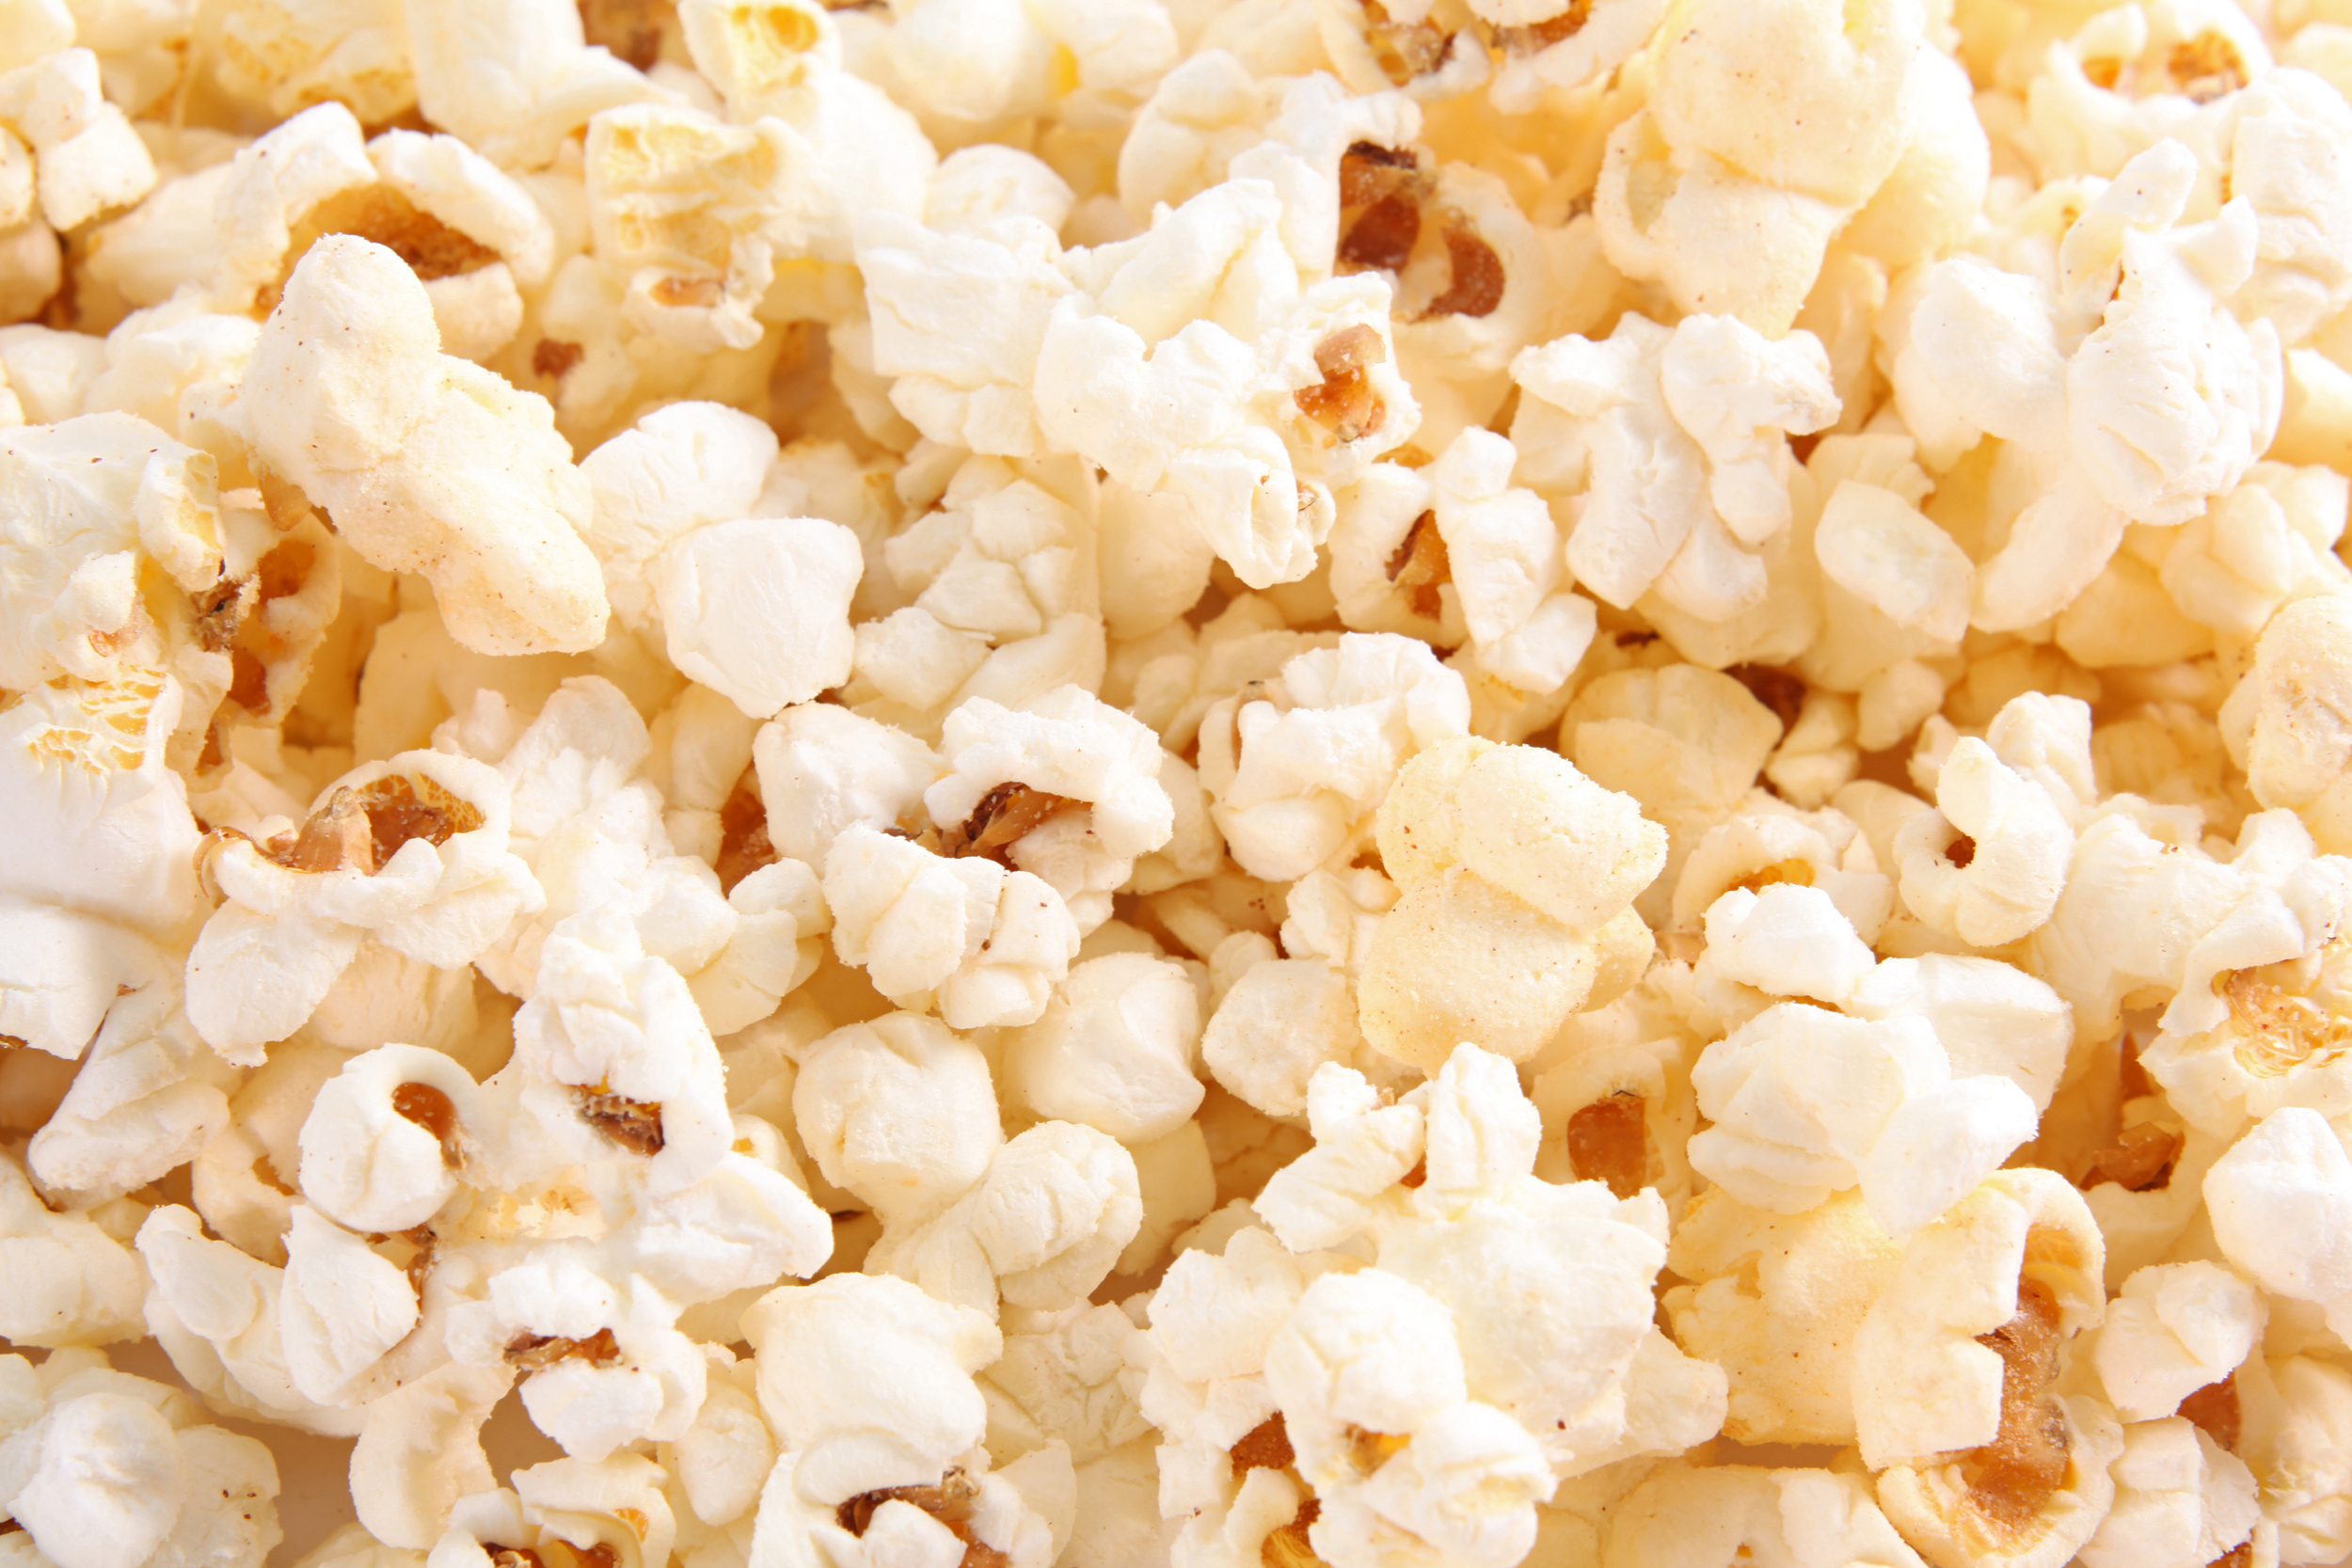 2500x1667 > Popcorn Wallpapers